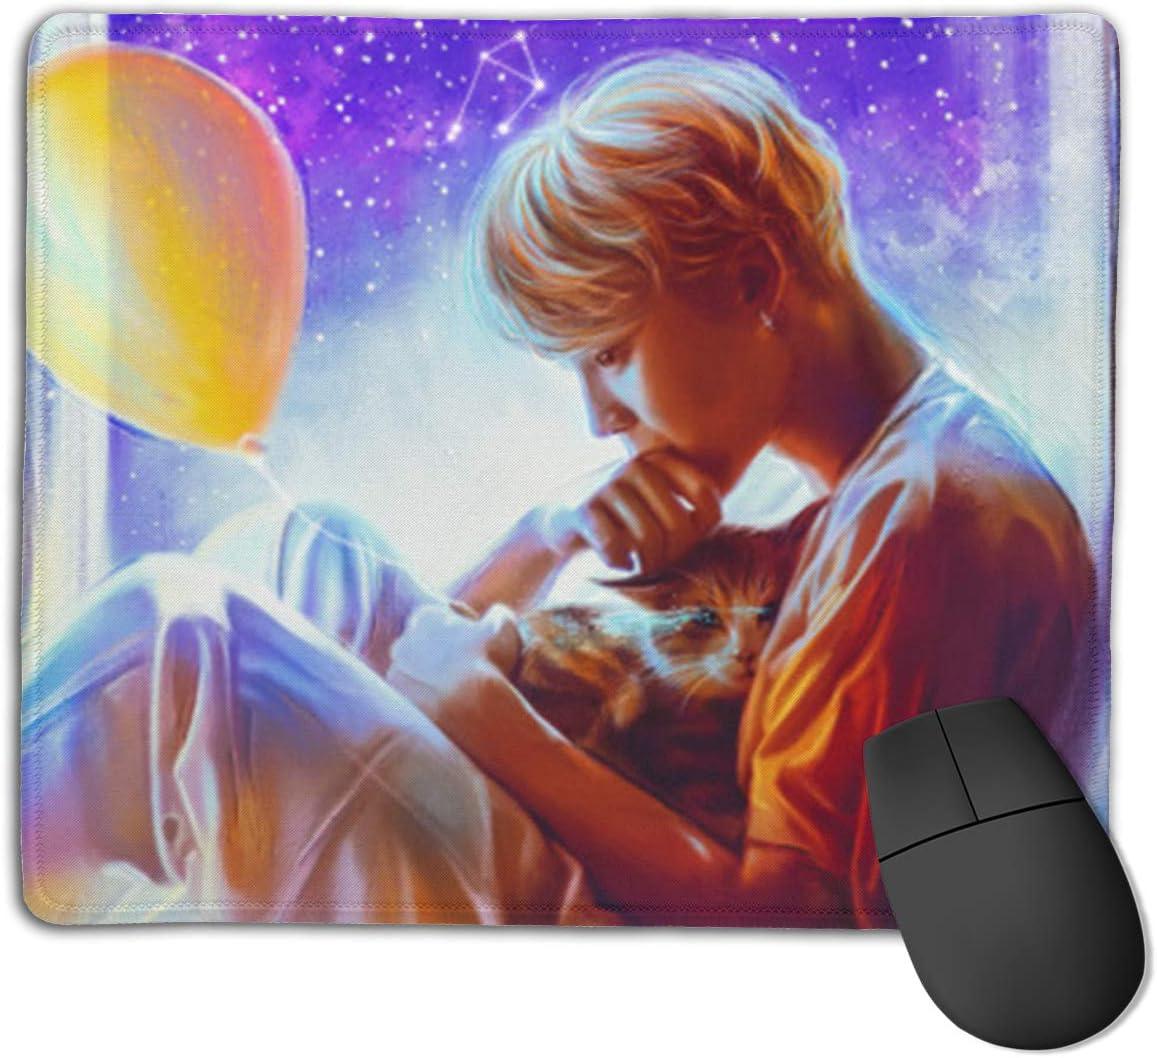 Jimin Serendipity Locking Mouse Pad Anti-Slip Soft Gaming Rubber Mousepads